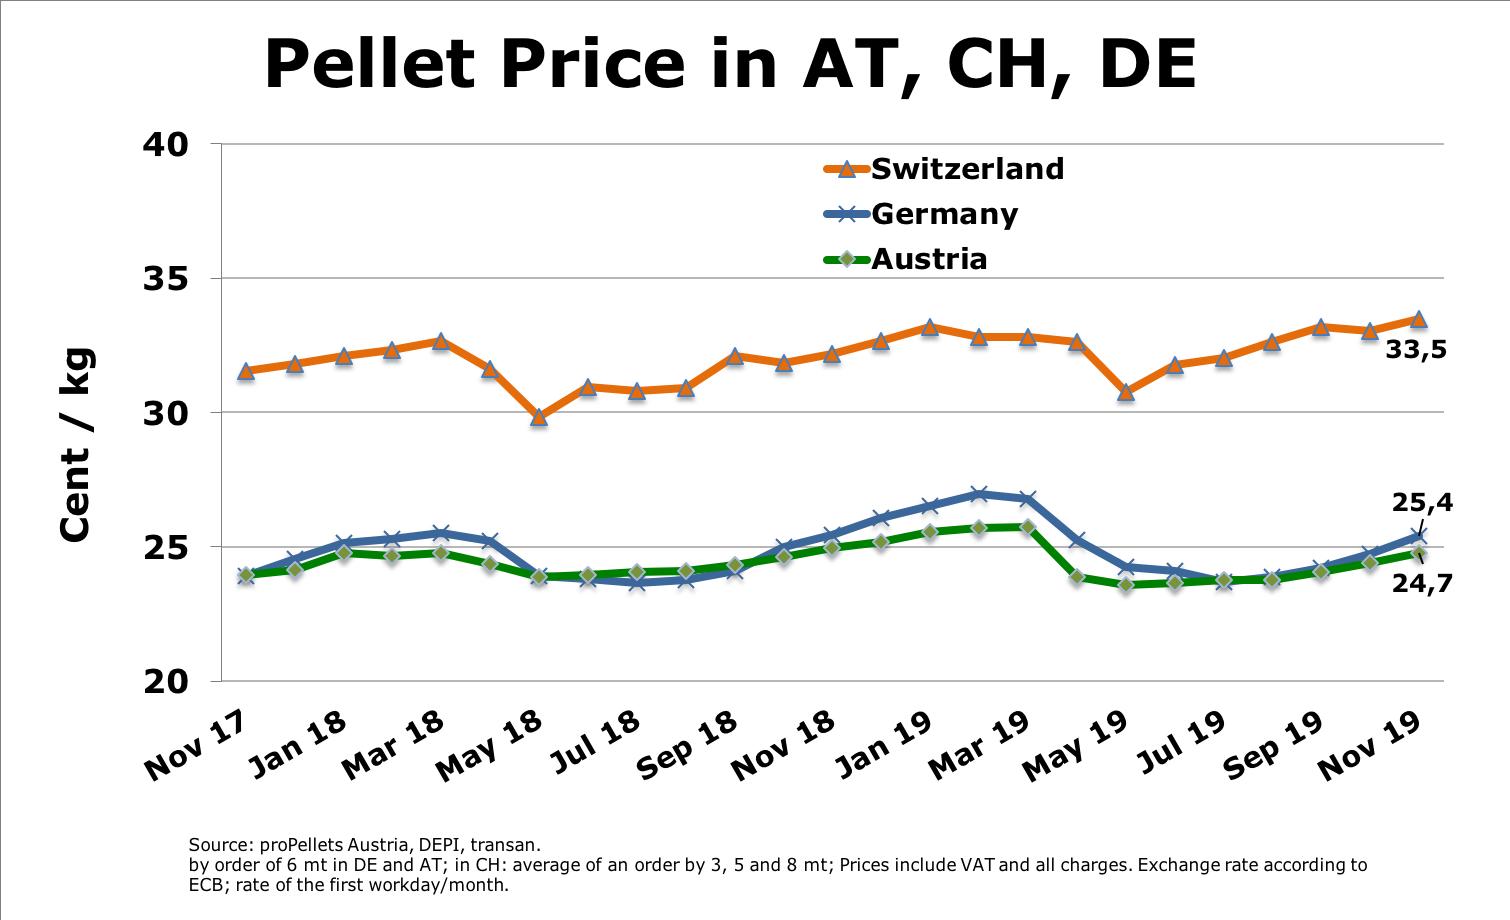 International Pellet Prices